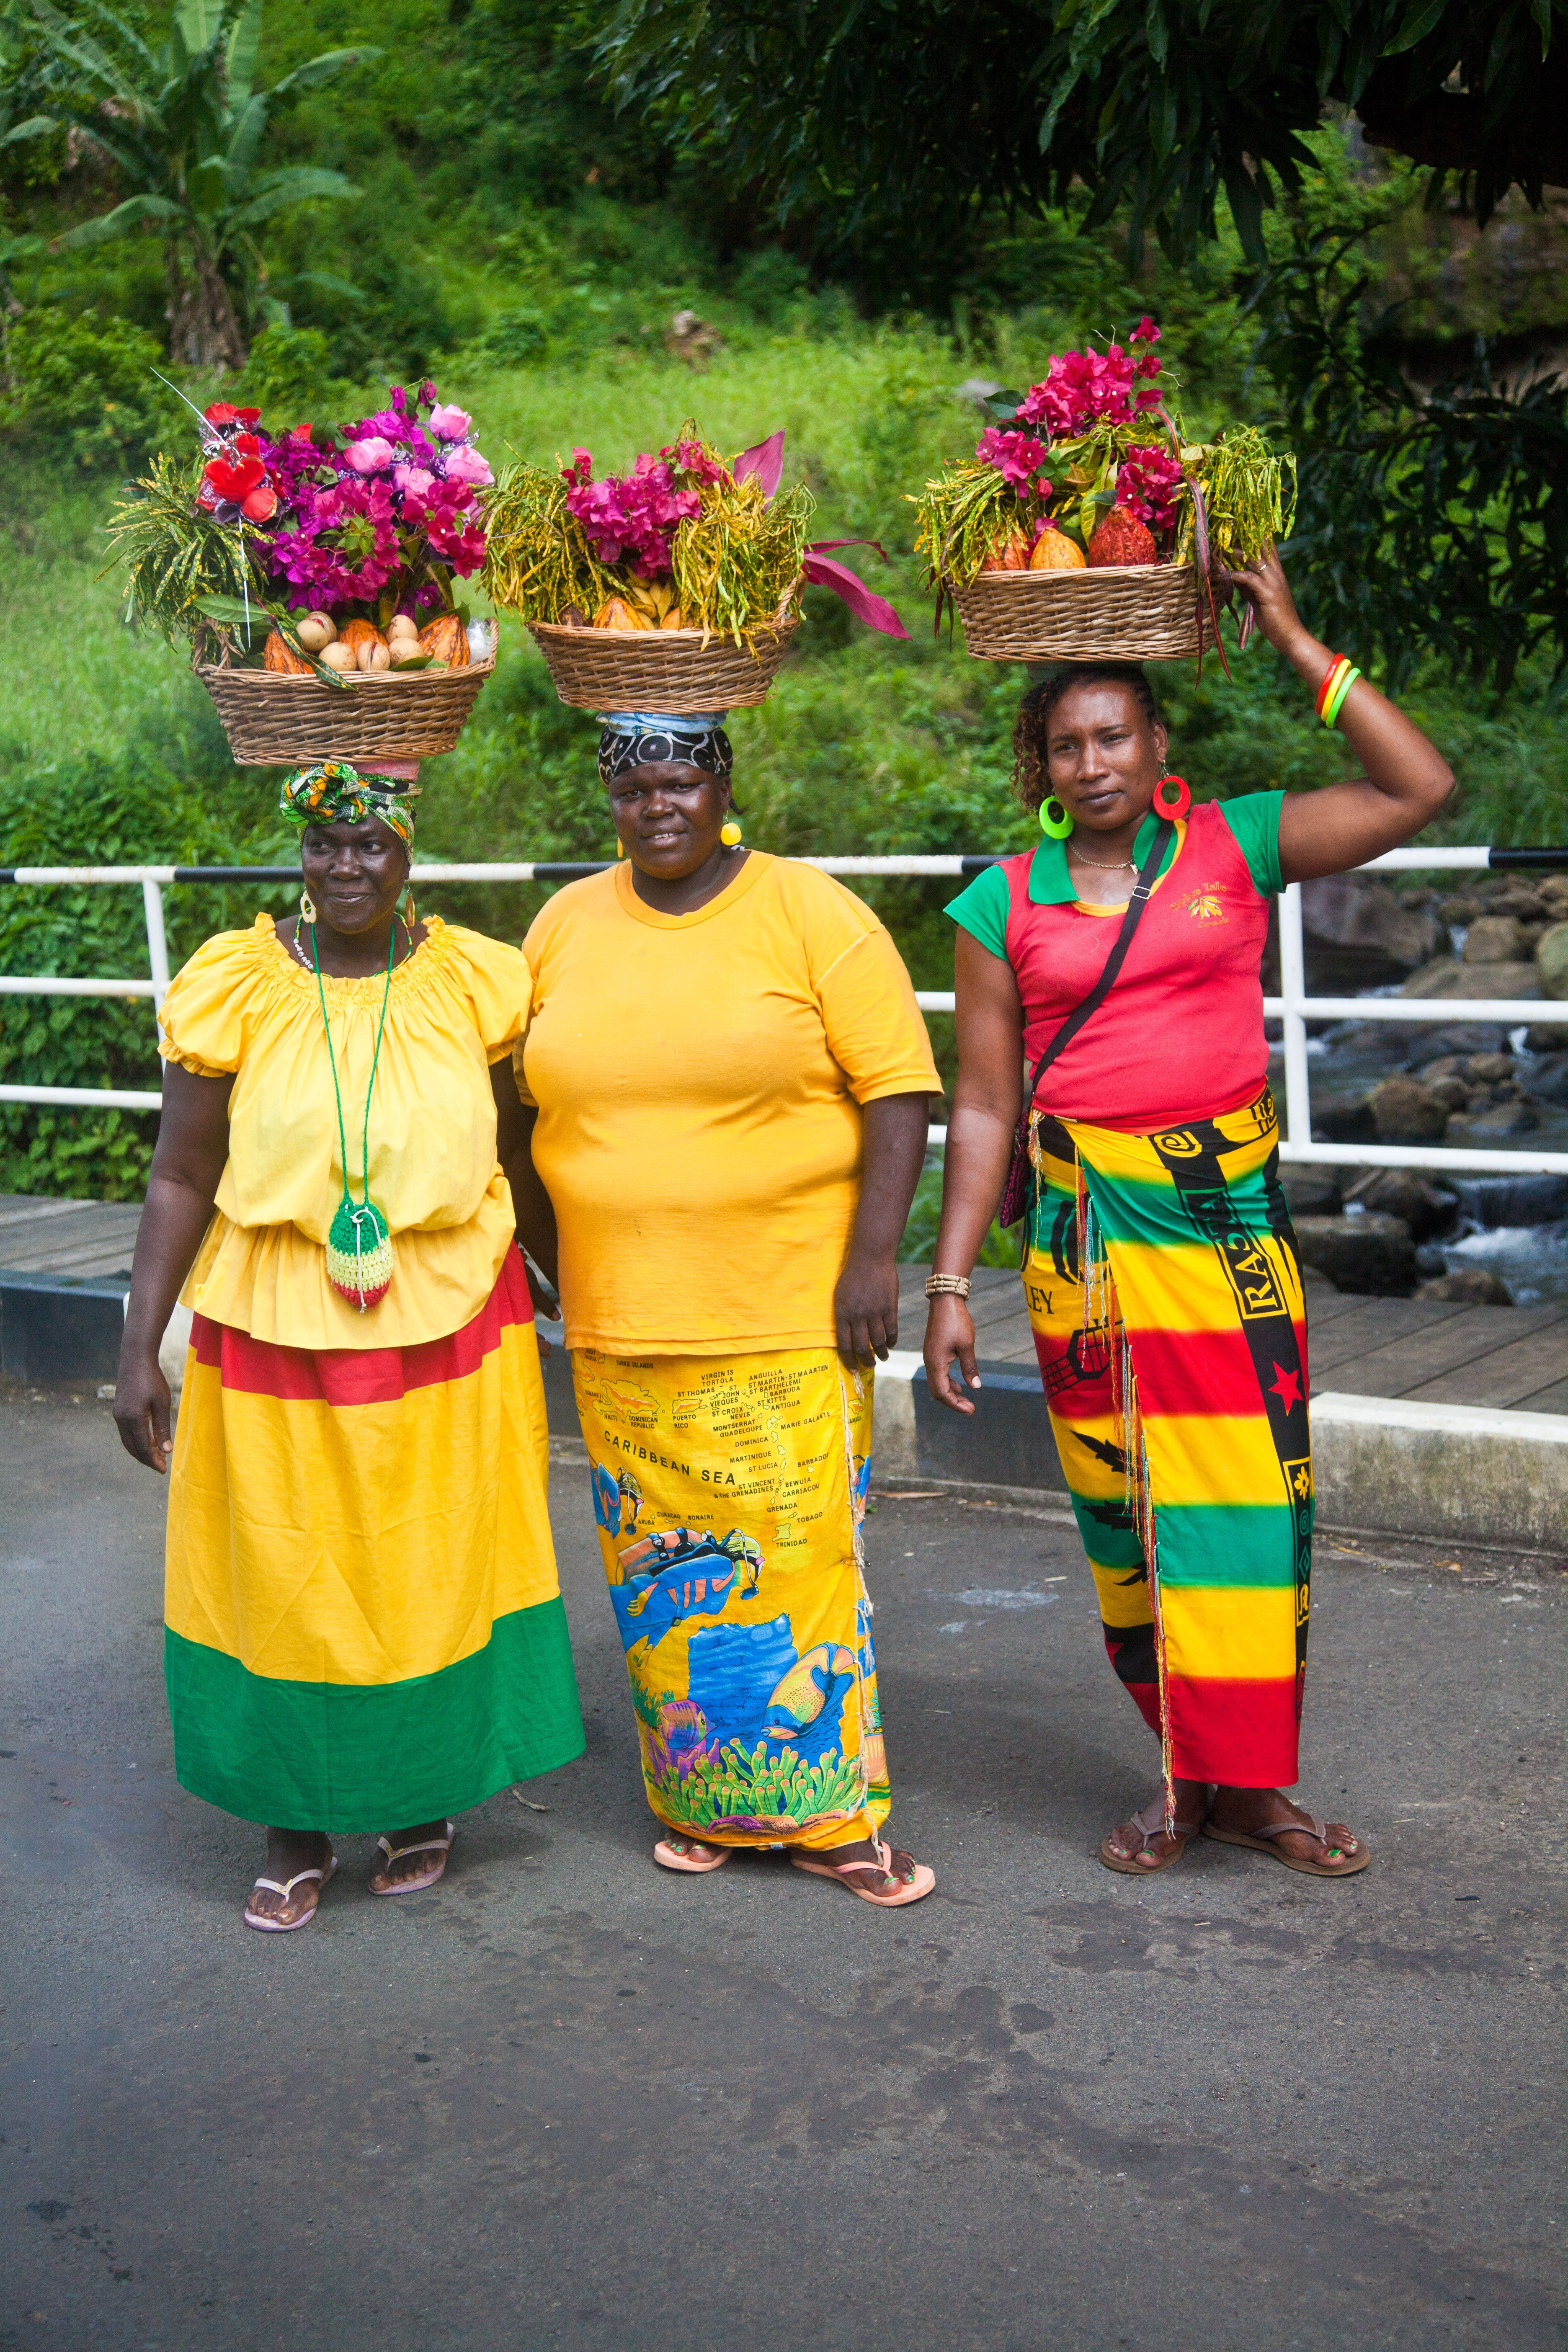 Trinidad and Tobago is a twin-island nation that is rich ... |Trinidad And Tobago Culture Islands